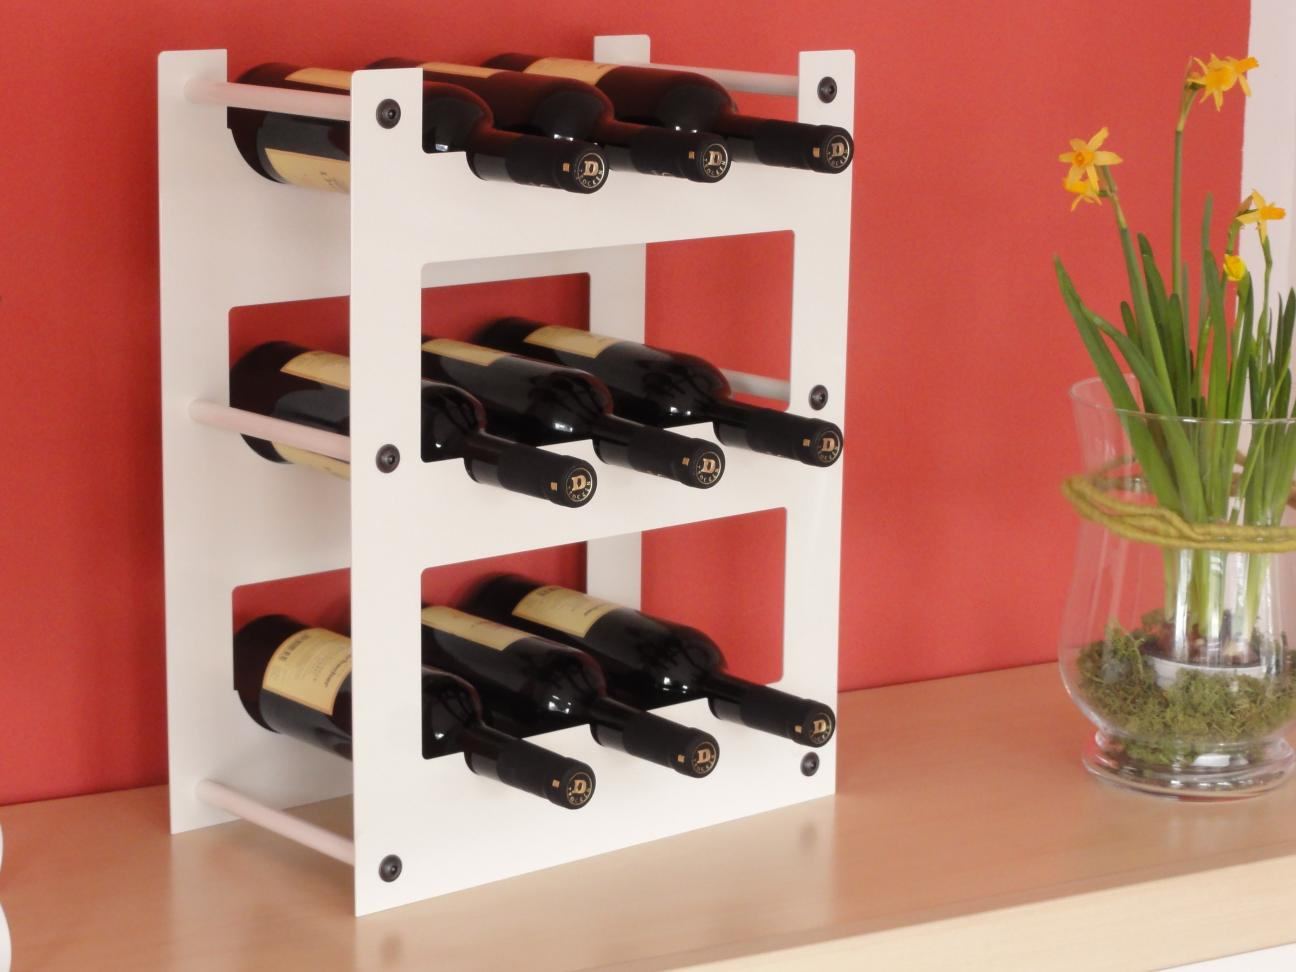 Weinregal f r 9 flaschen aus metall design h nge regal for Design artikel shop